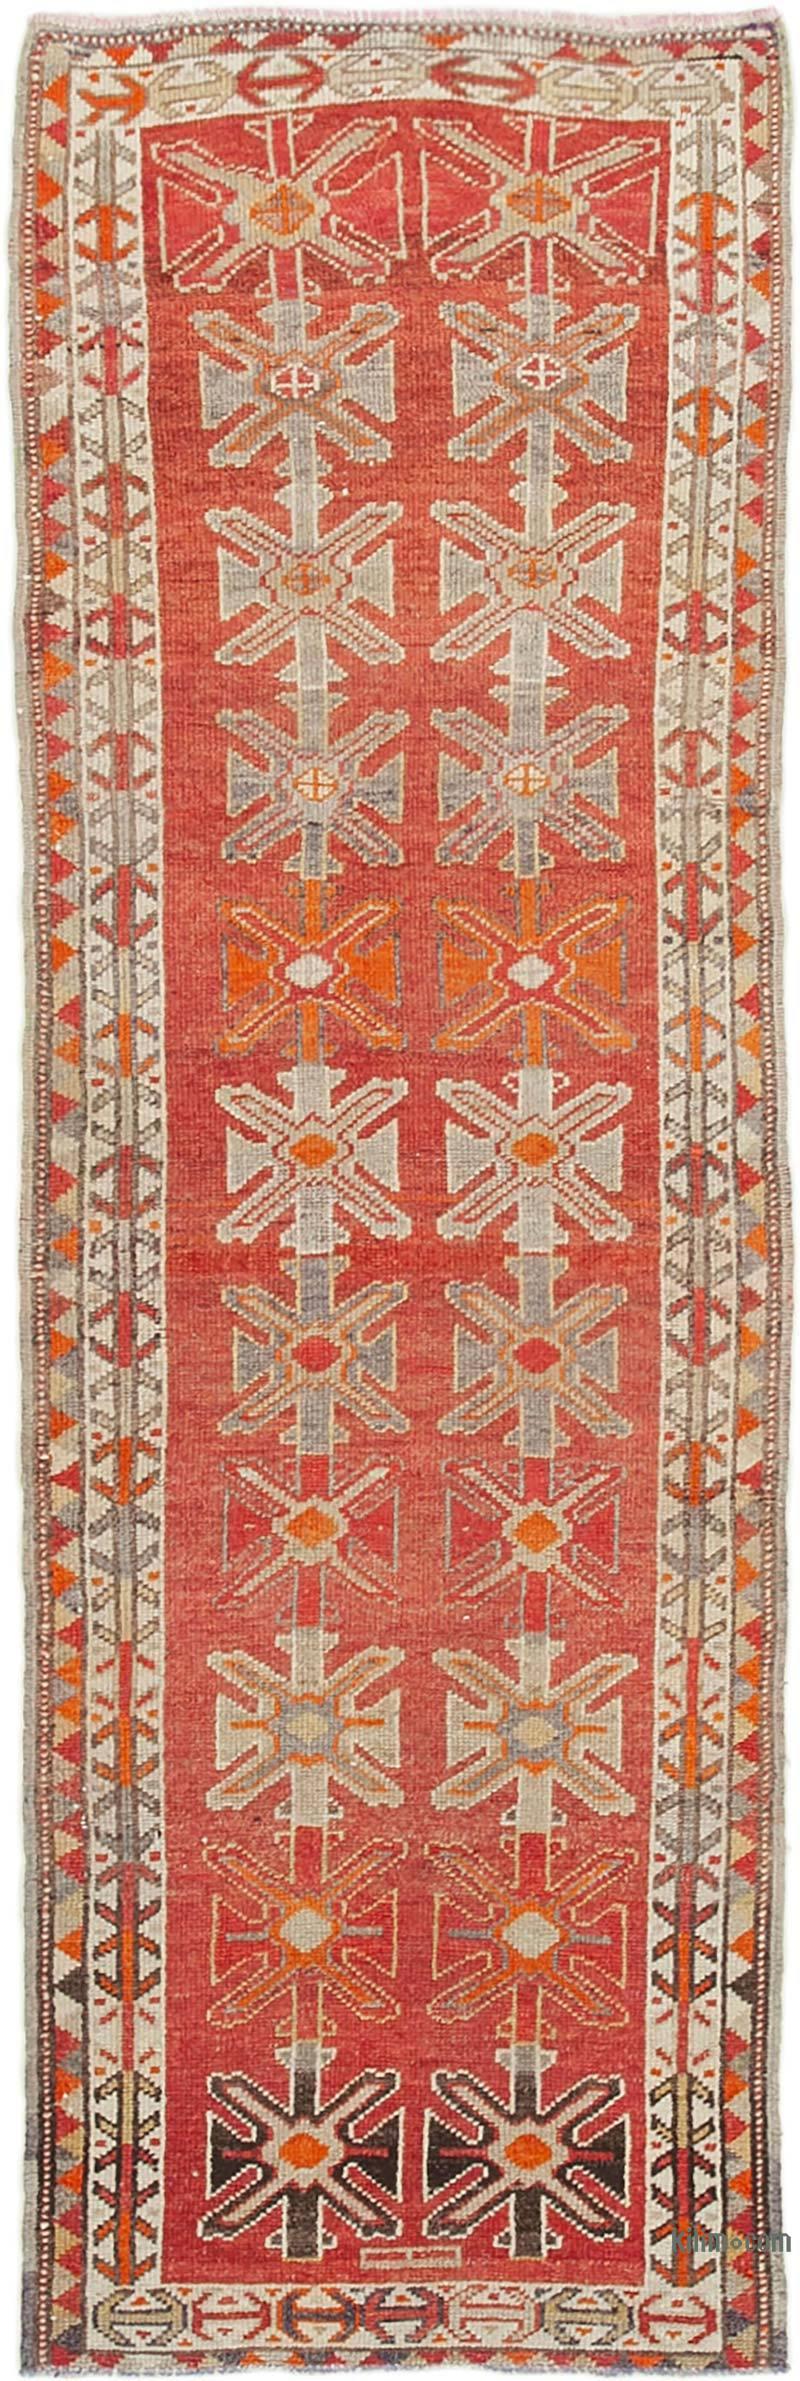 "Vintage Turkish Runner Rug - 3' 5"" x 10' 3"" (41 in. x 123 in.) - K0054353"